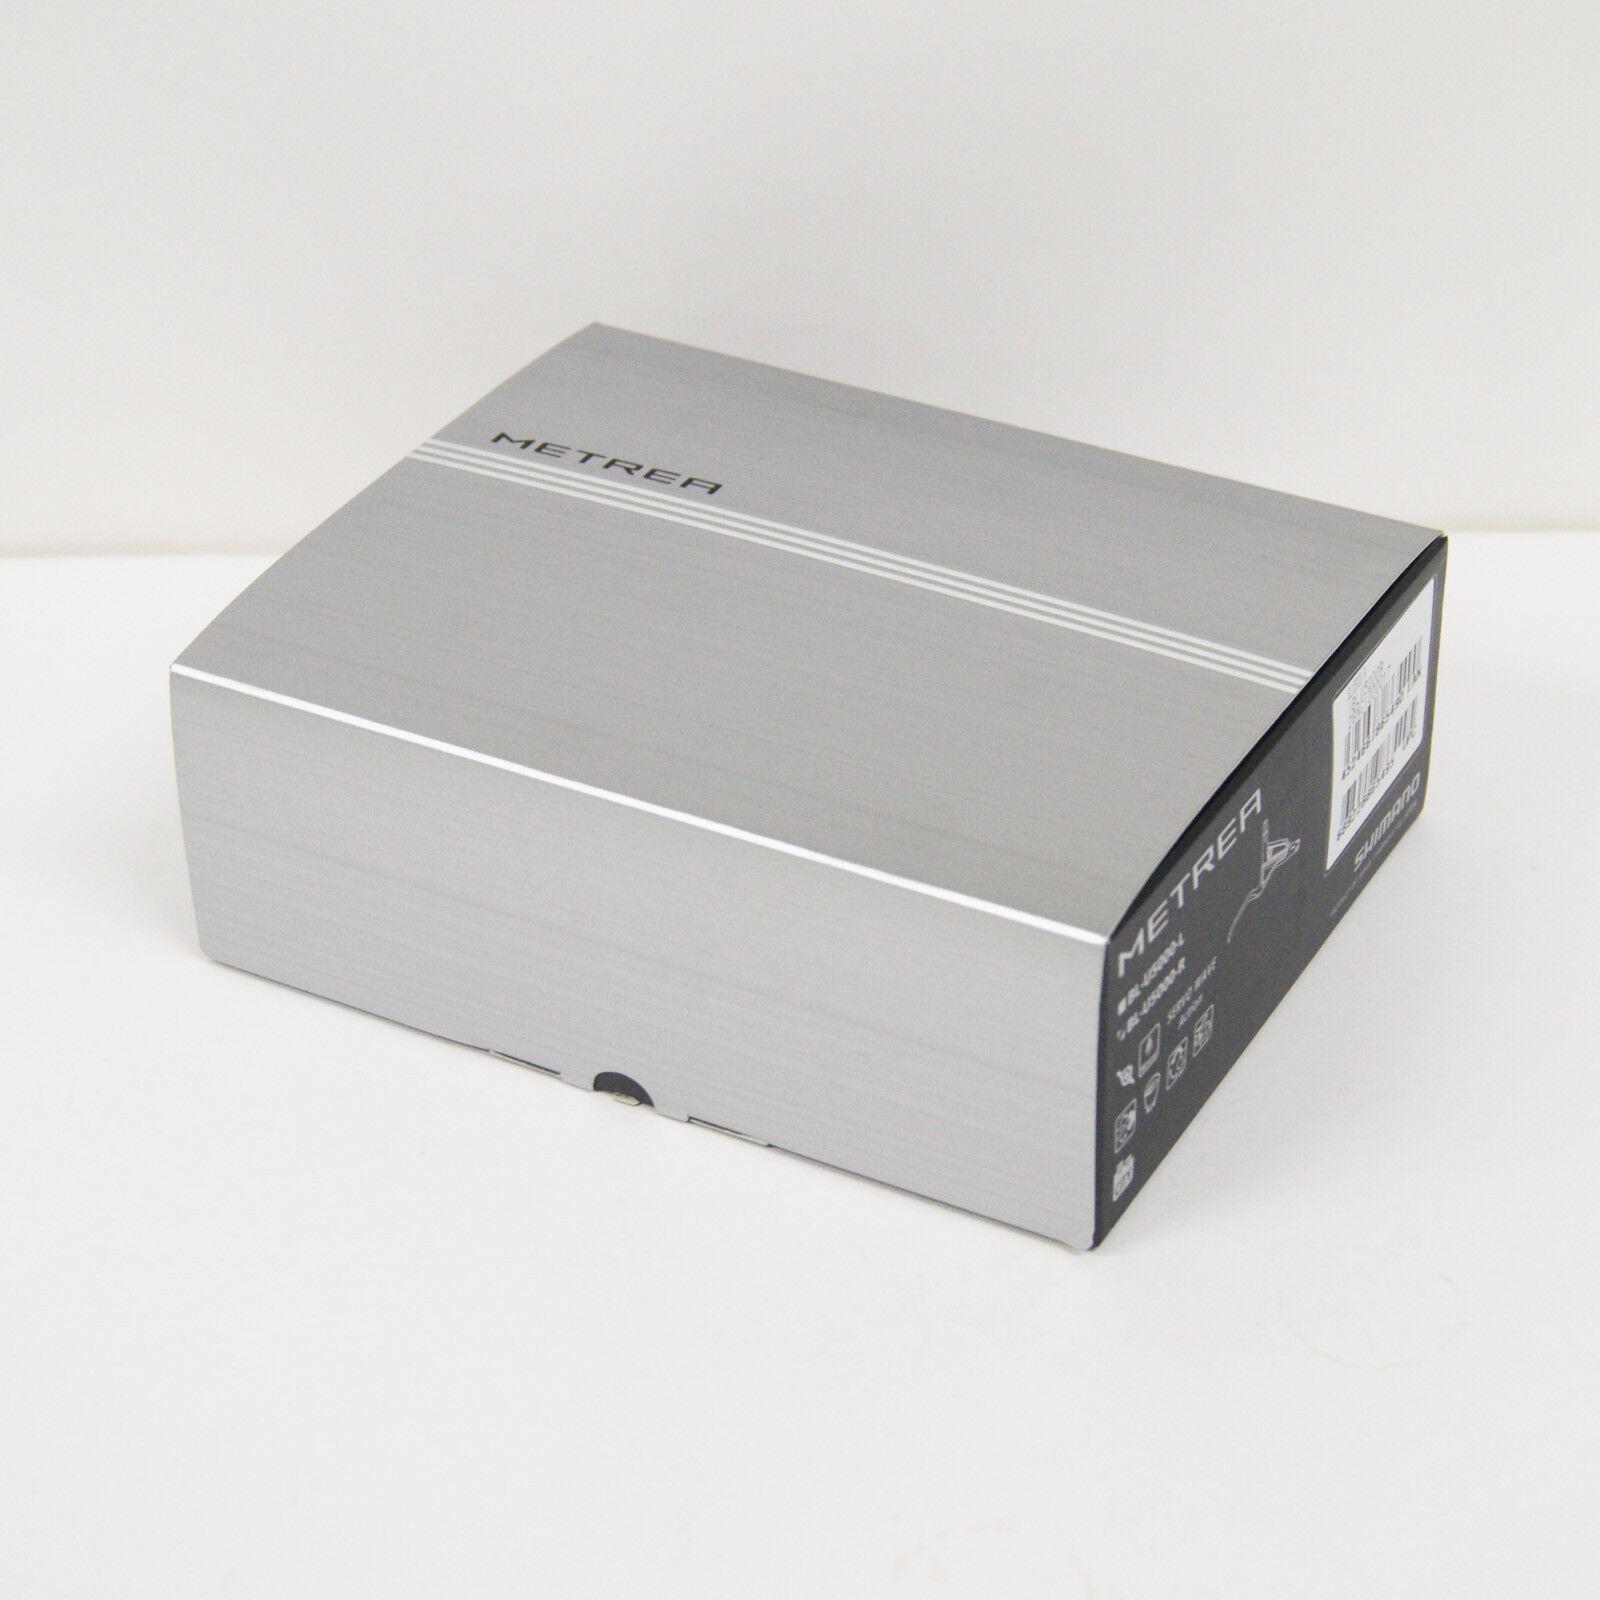 Shimano METREA BL-U5000 I-Spec II Hydraulic Disc Brake Lever (Right) Ibluee5000R